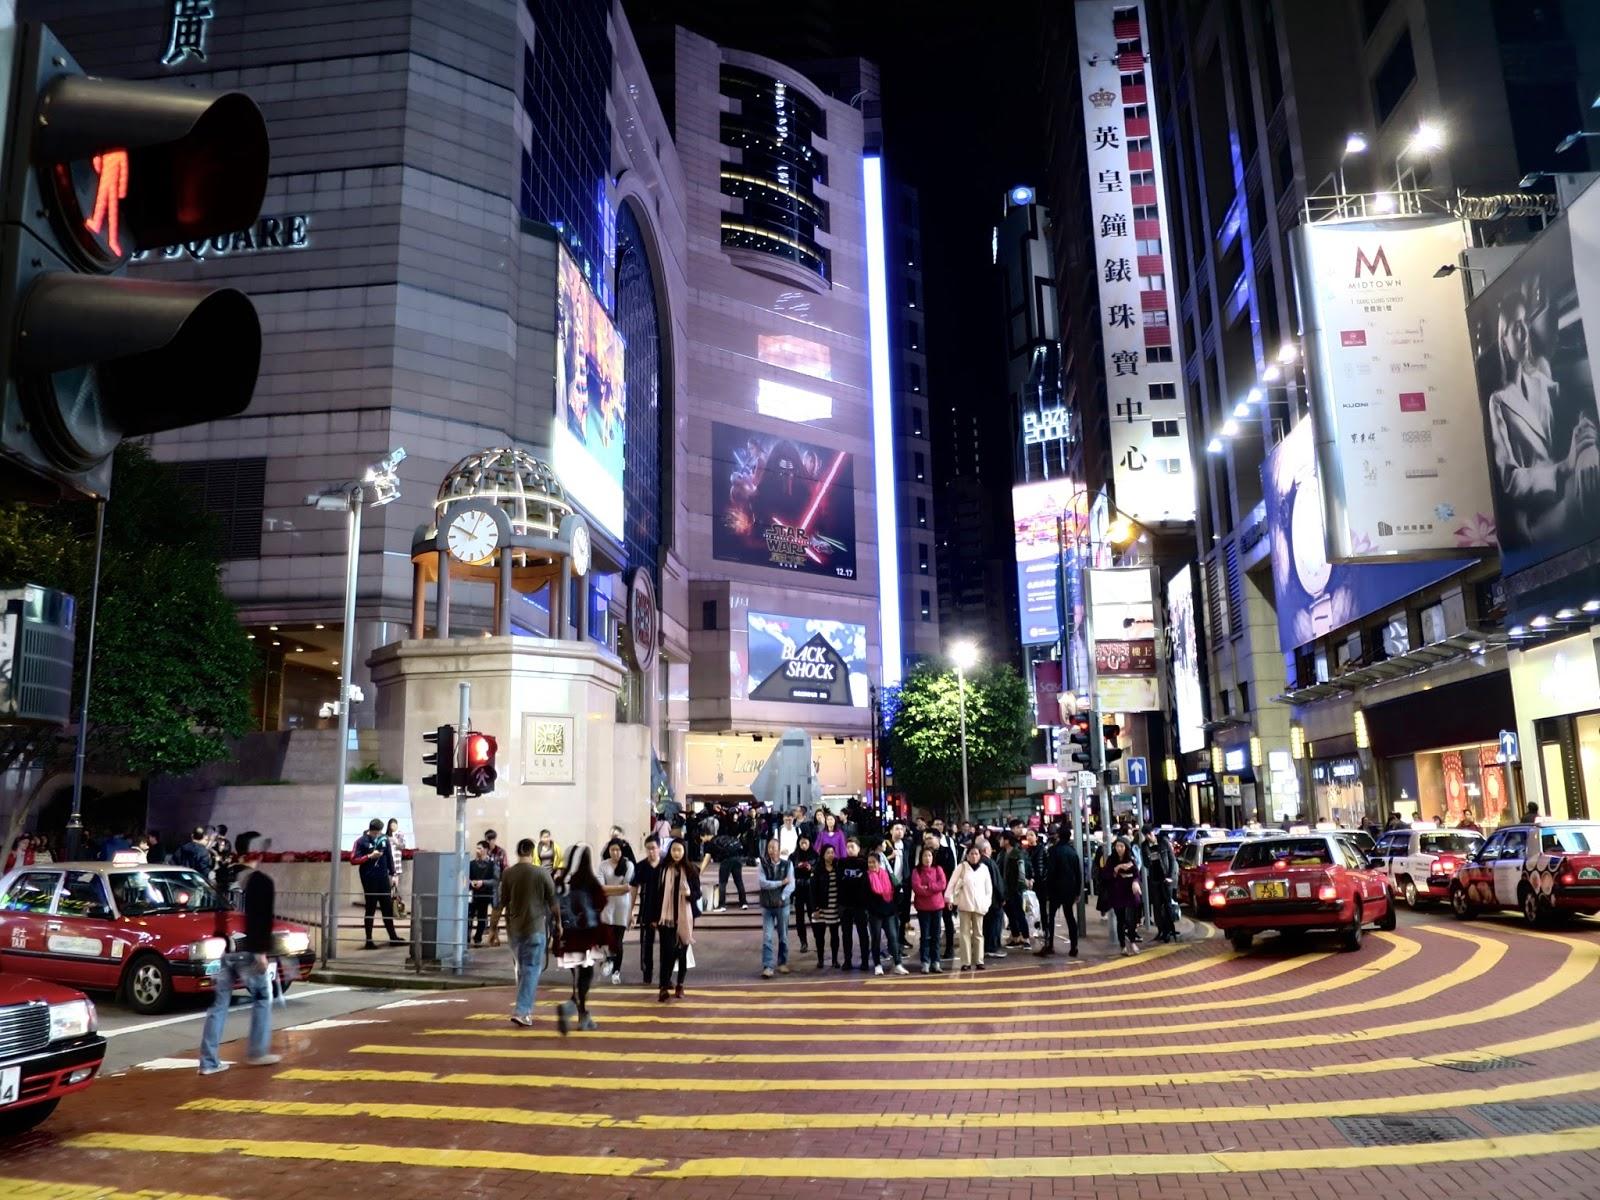 causeway bay, hong kong, travel, photography, times square, city